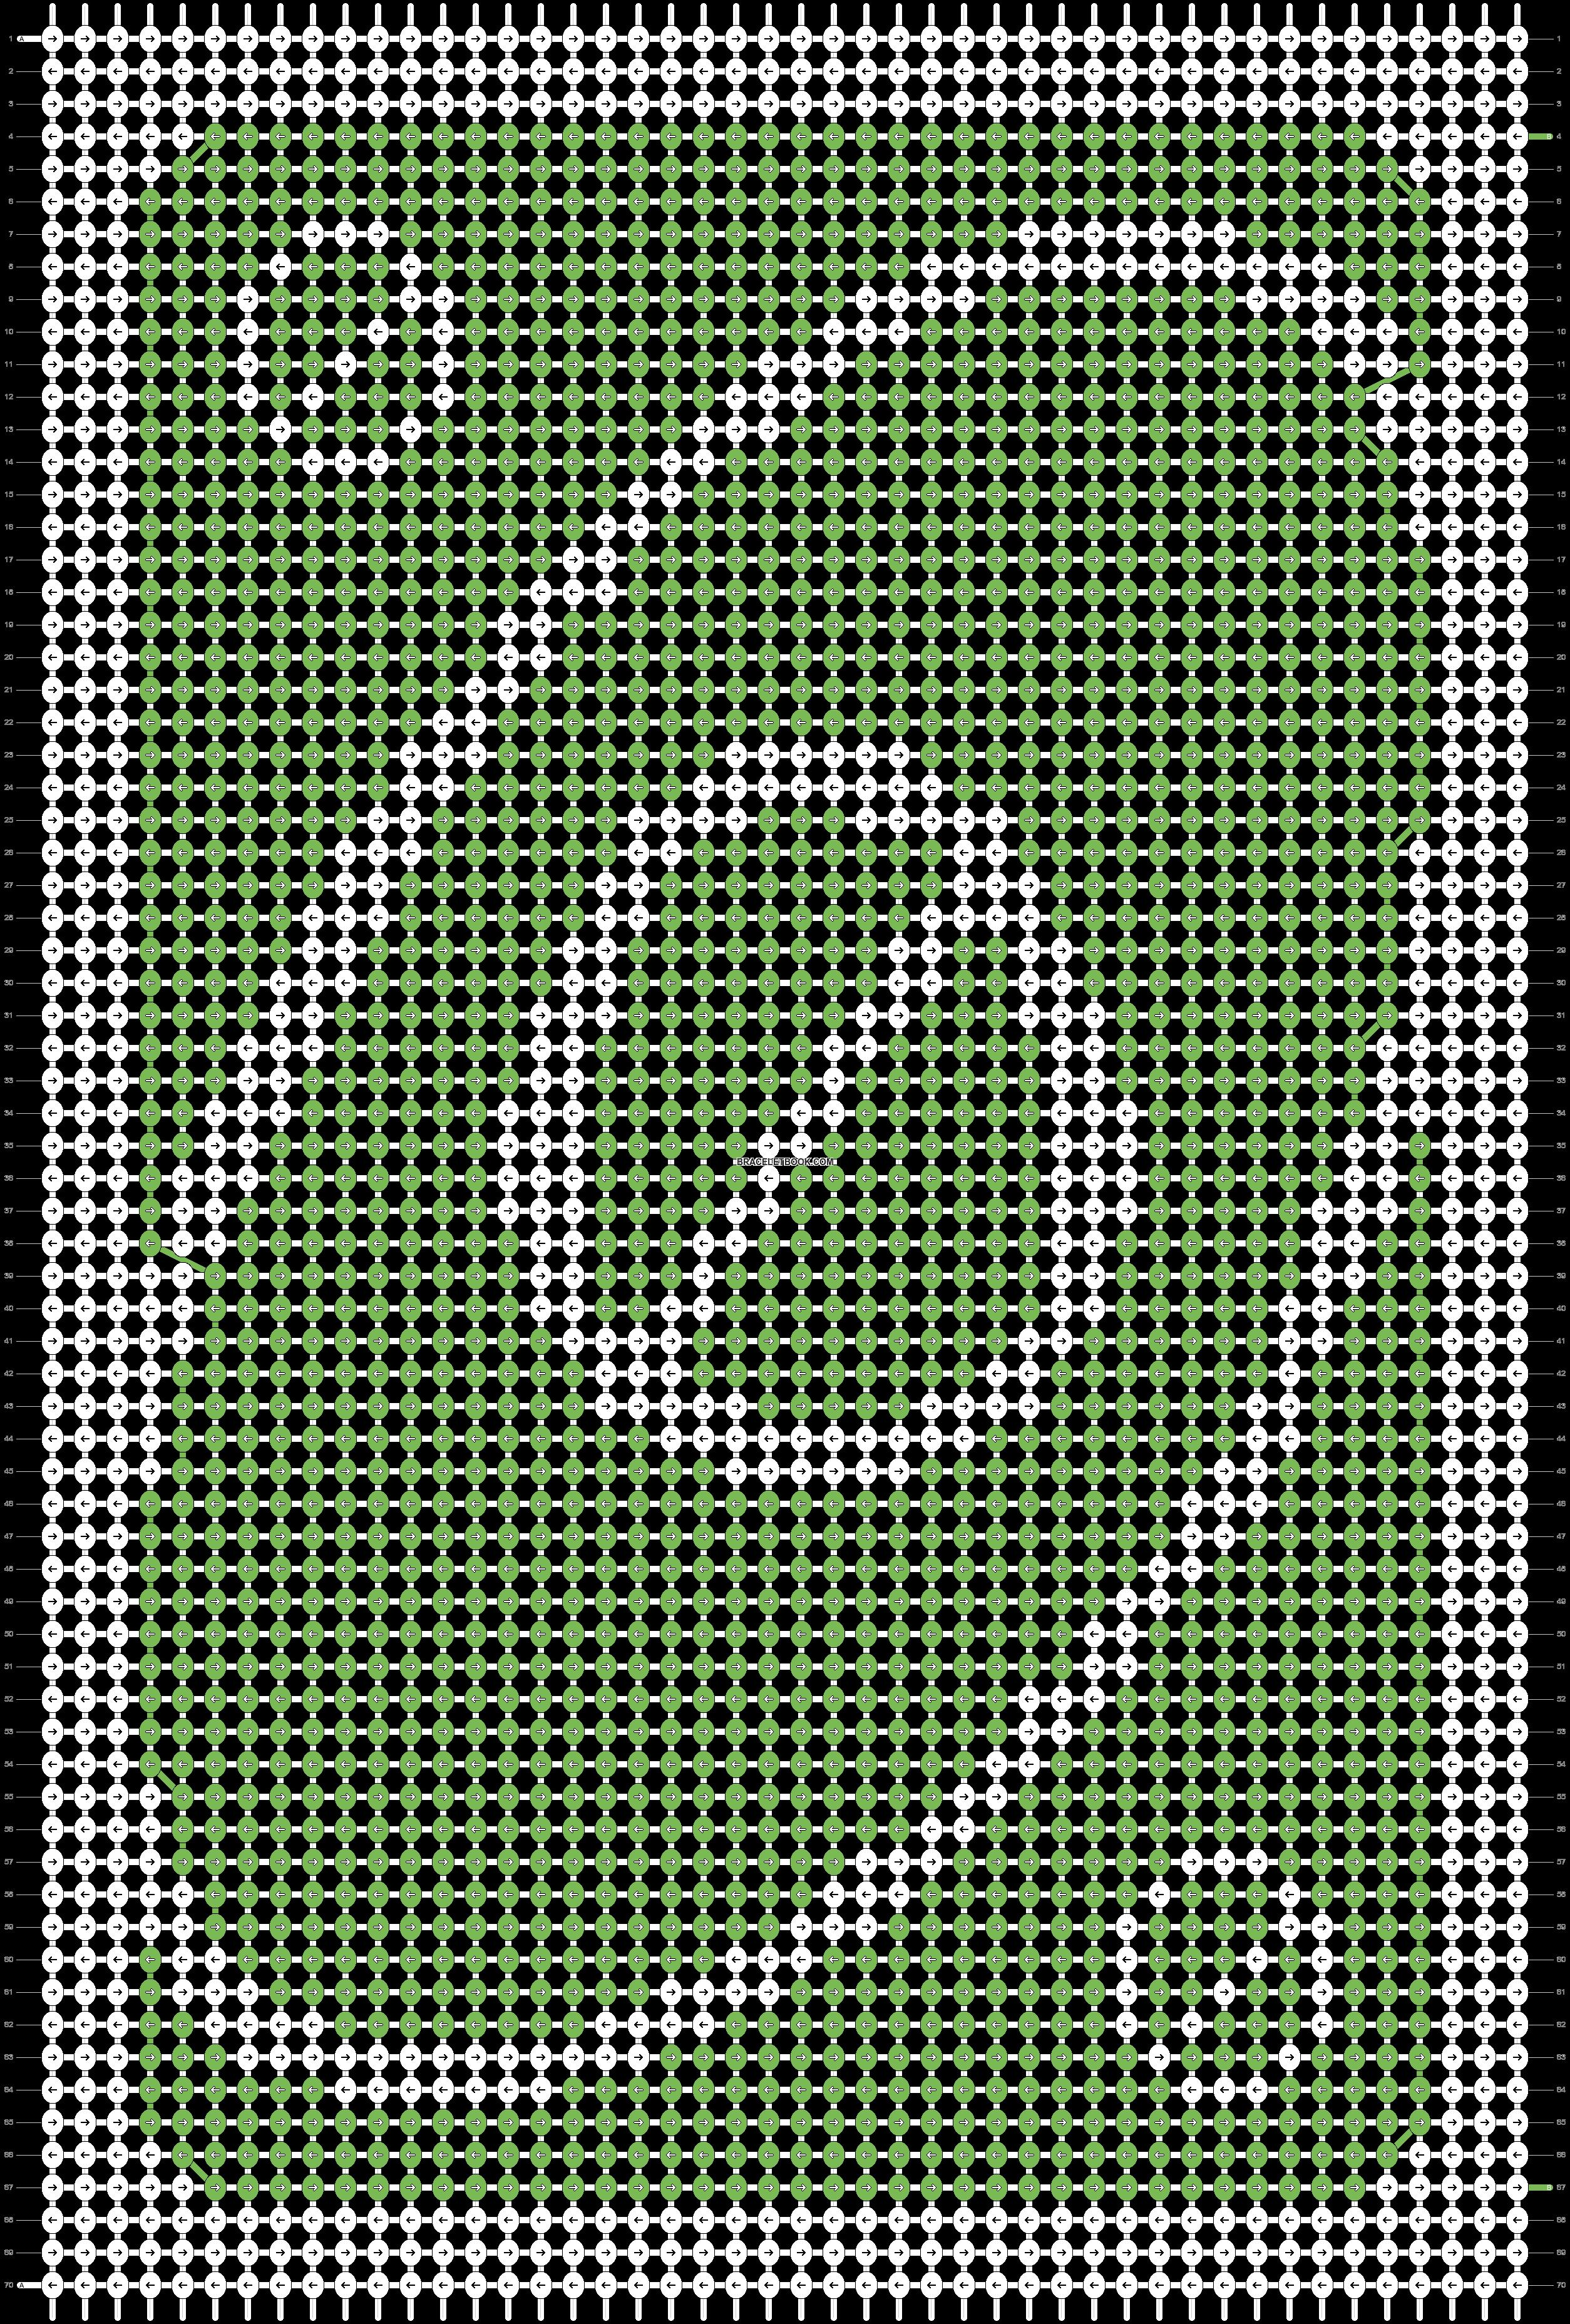 Alpha pattern #29947 pattern